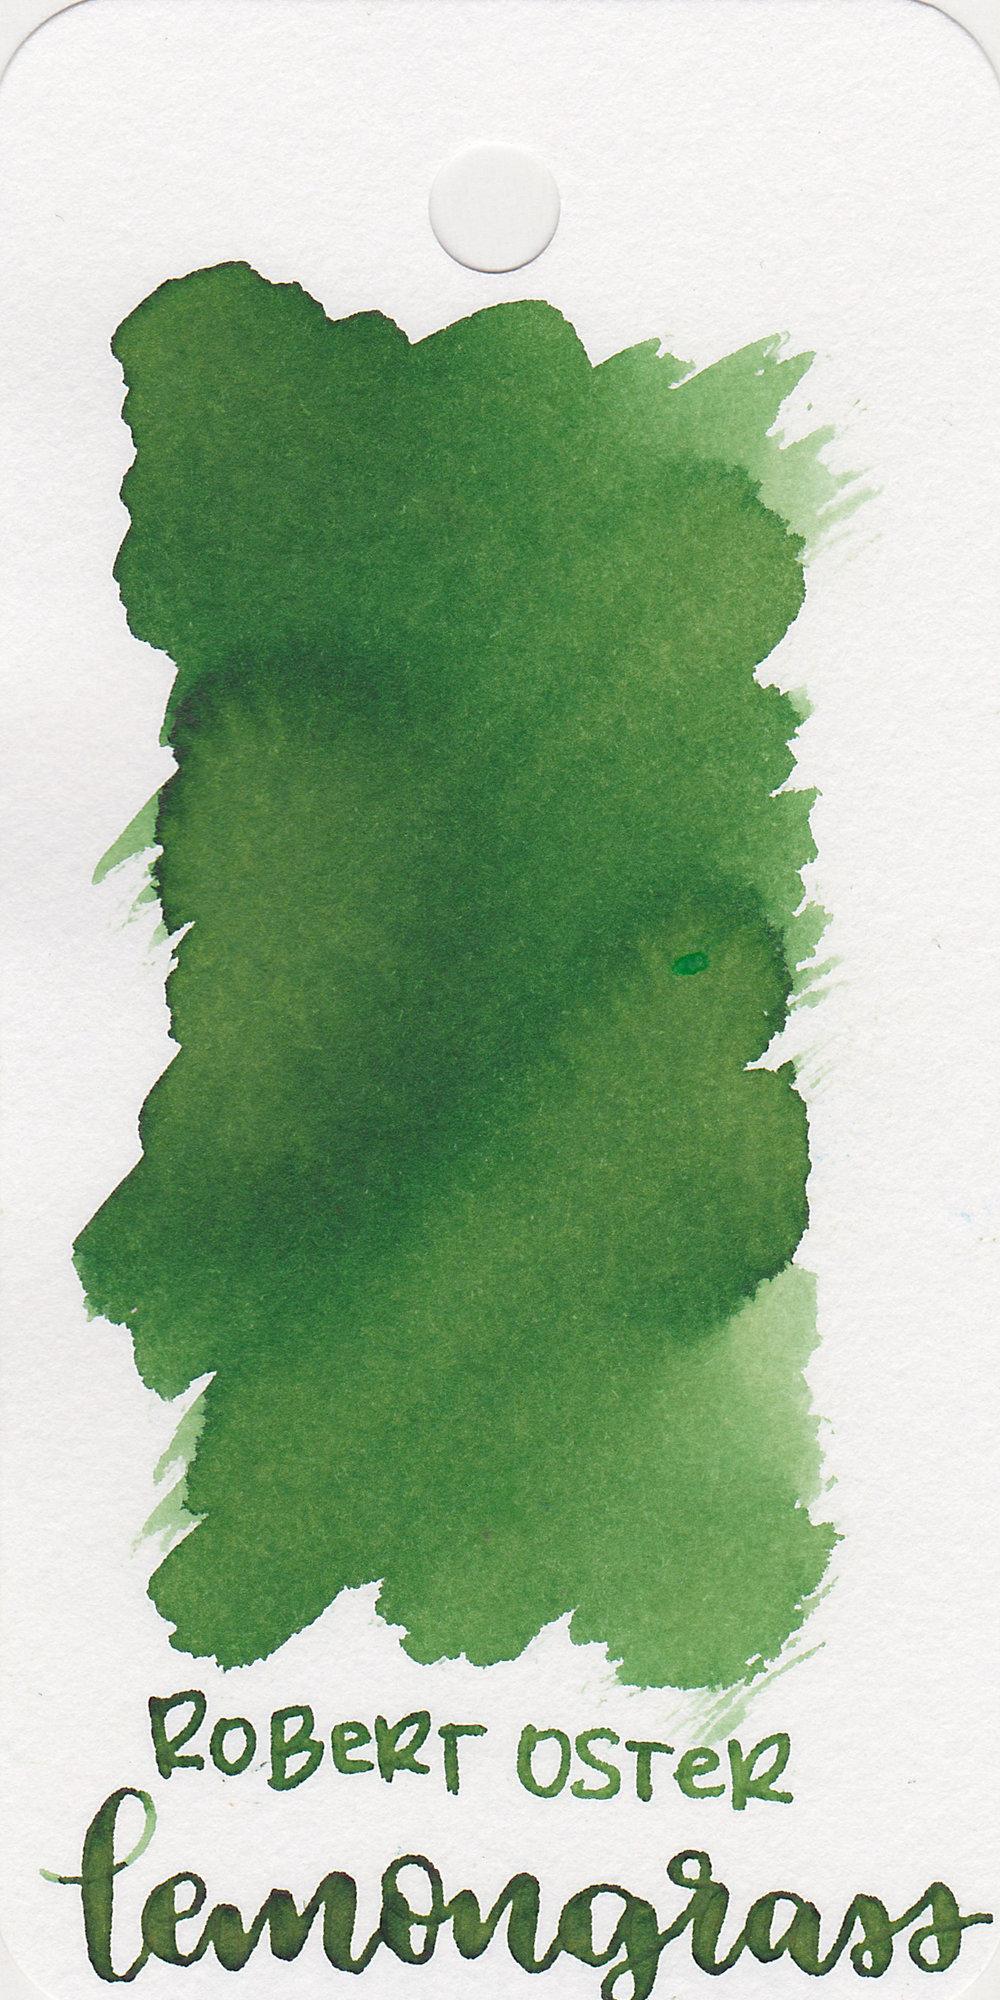 The color: - Lemon Grass is a medium-dark green.